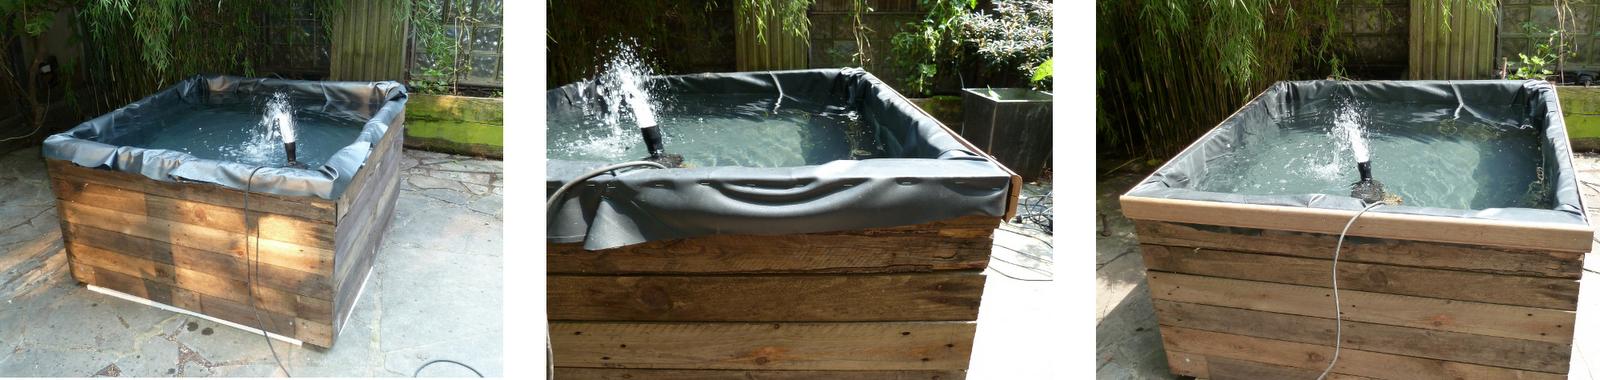 fabriquer un bassin en bois. Black Bedroom Furniture Sets. Home Design Ideas